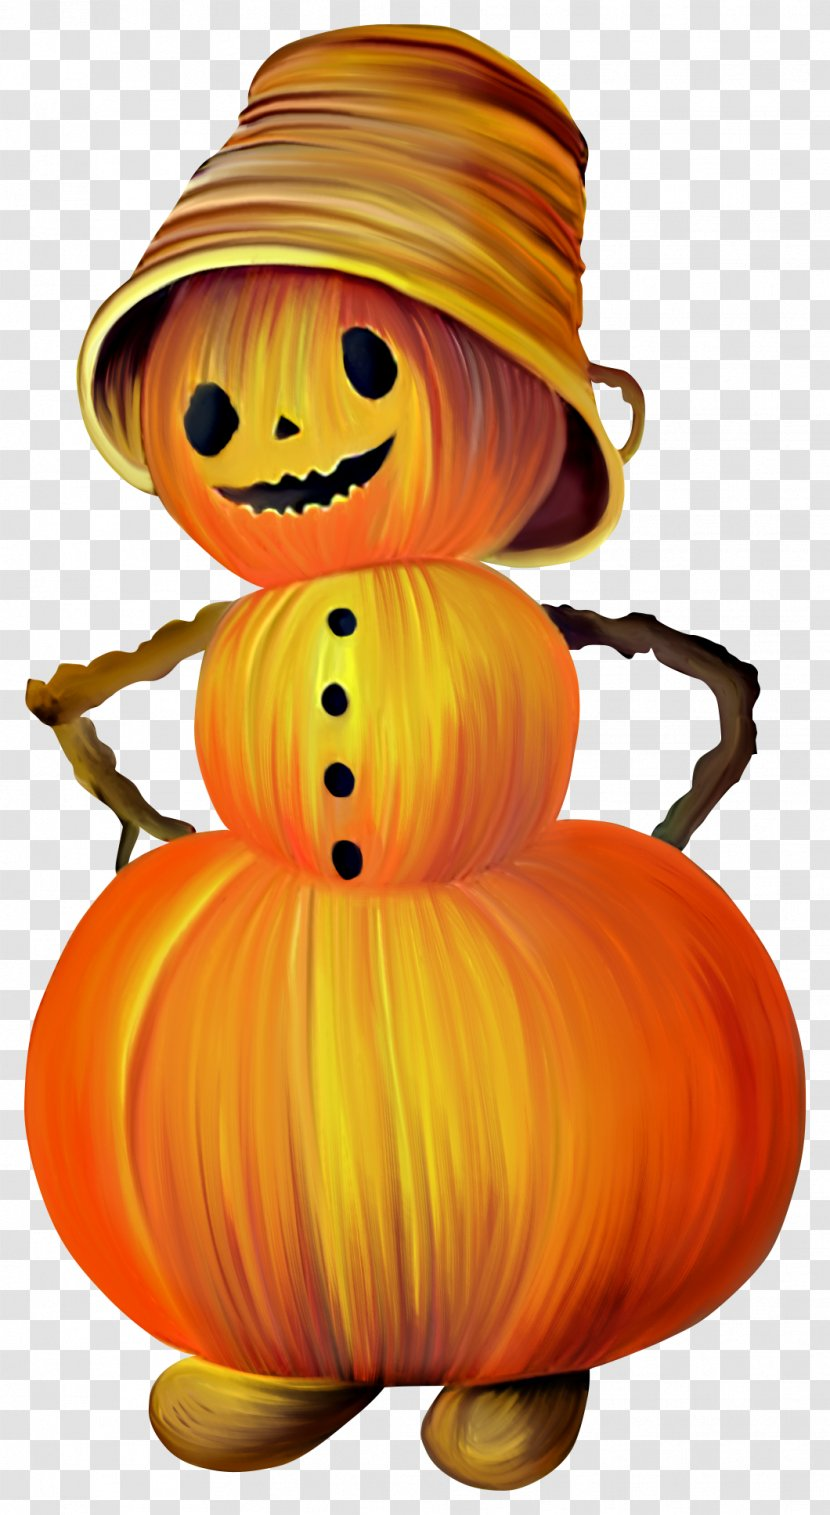 Halloween Jack-o-lantern Pumpkin Clip Art - Jackolantern - Brown Man Transparent PNG